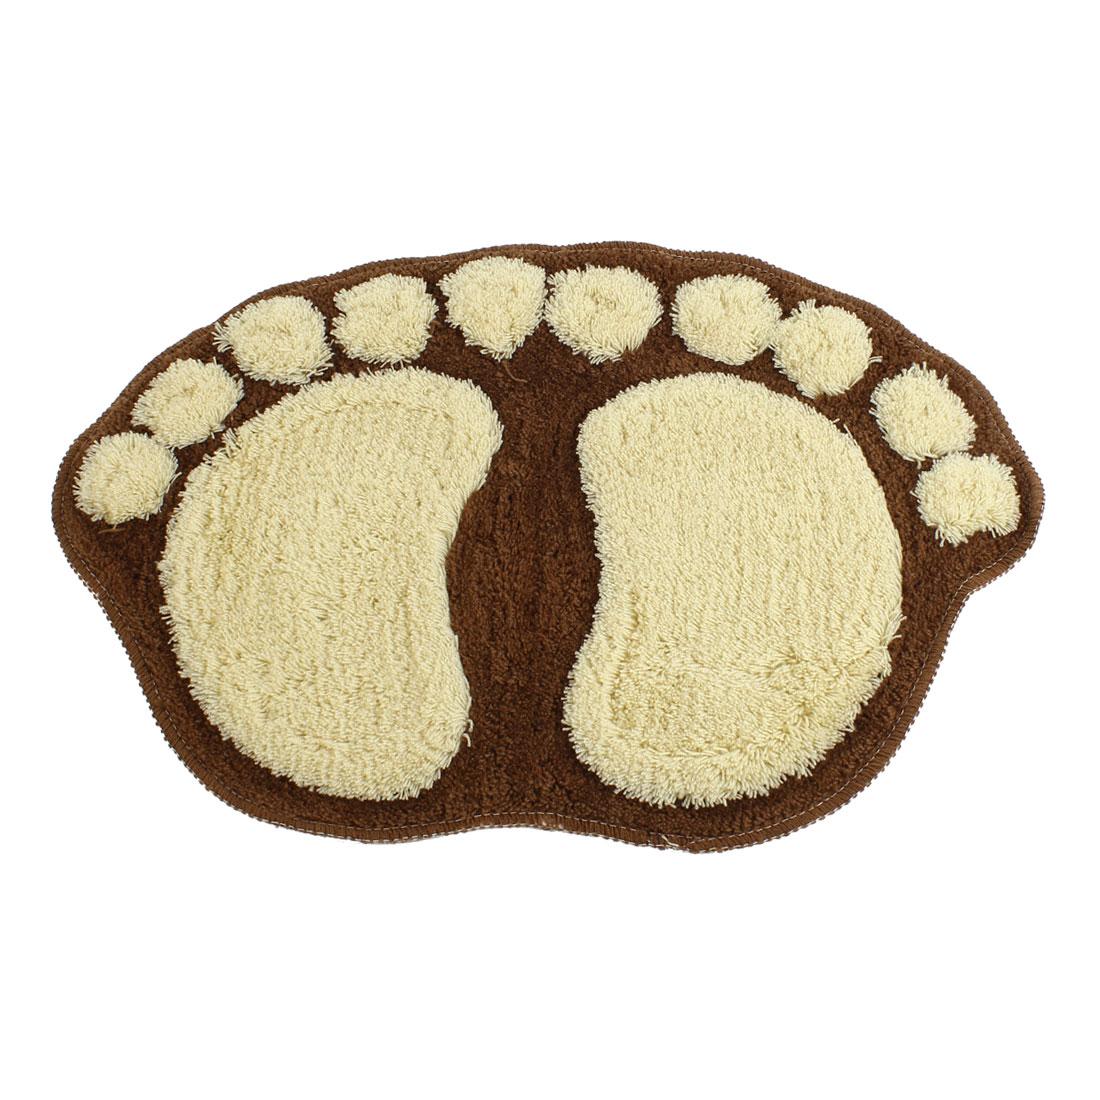 Microfiber Chenille Khaki Footprint Shape Floor Mat Area Carpet Coffee Color